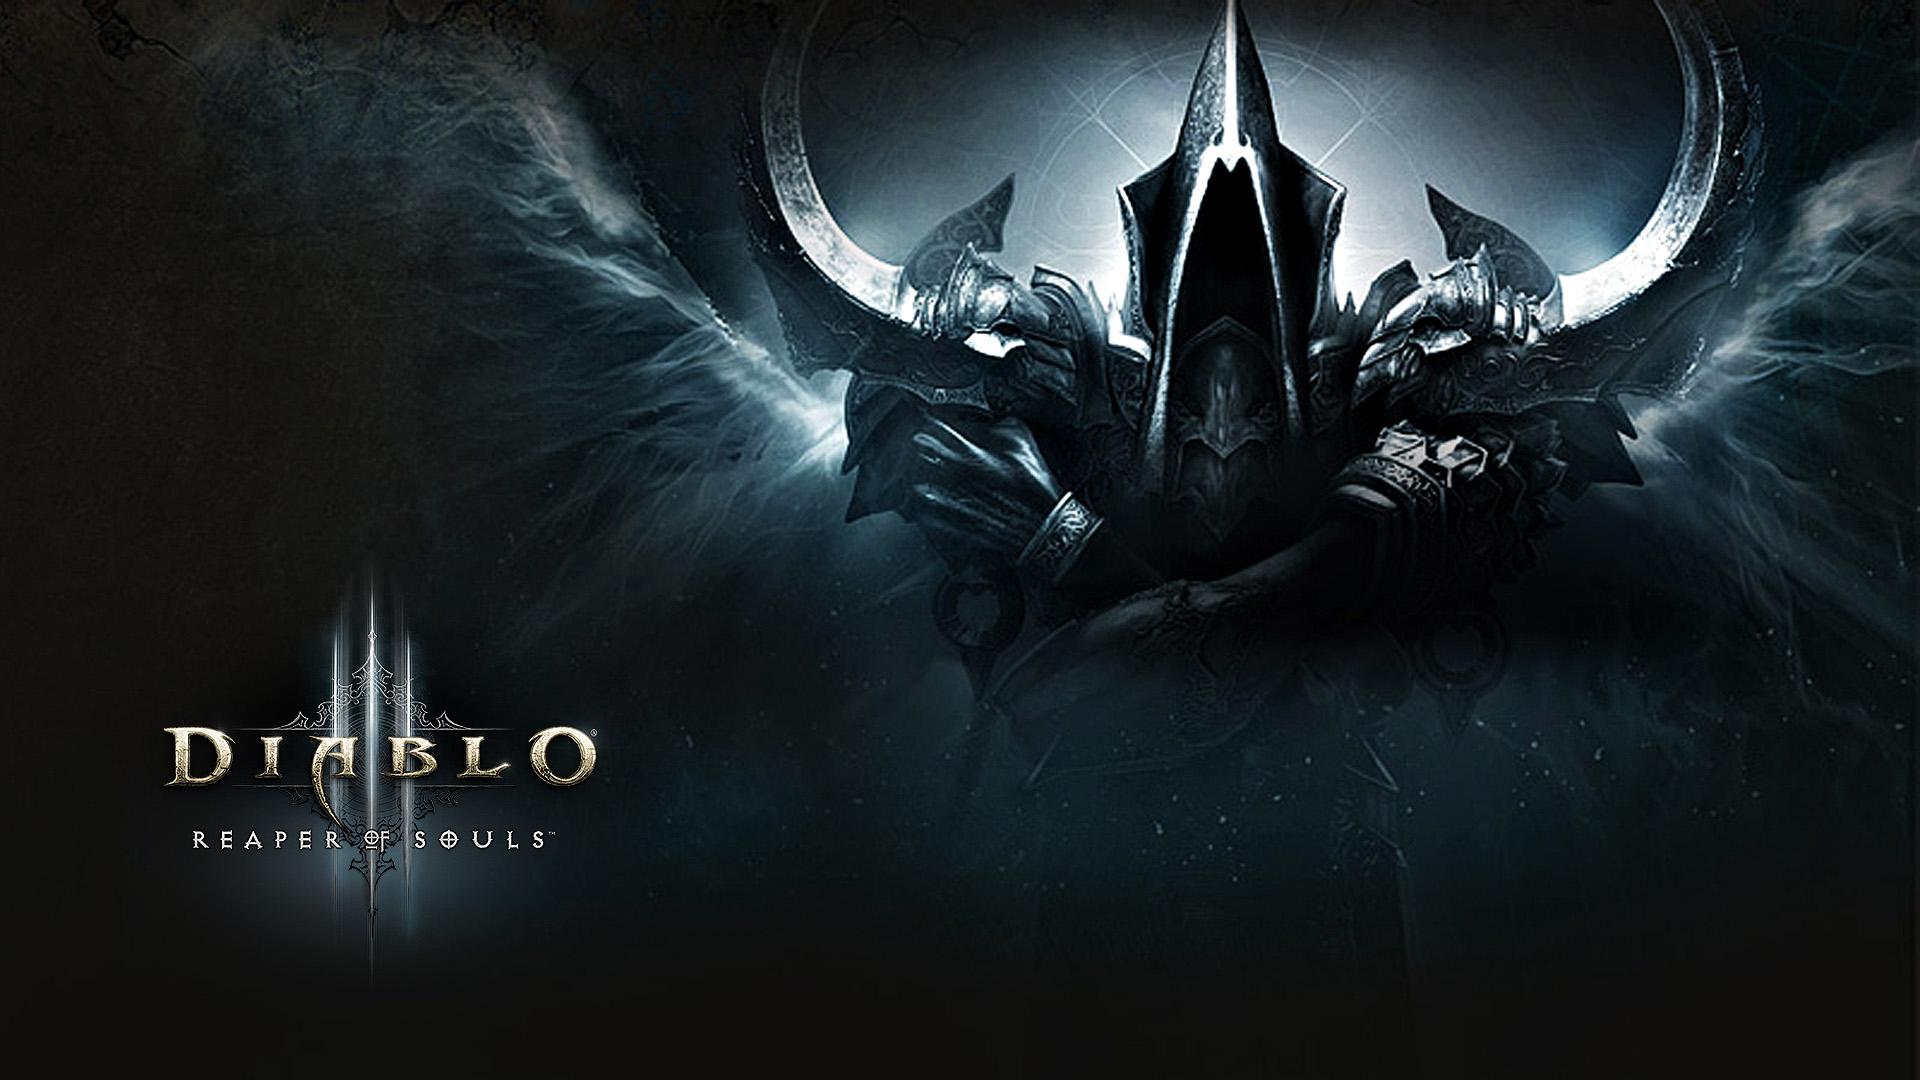 Diablo 3 Ros Wallpaper: Diablo 3 HD Wallpapers Widescreen